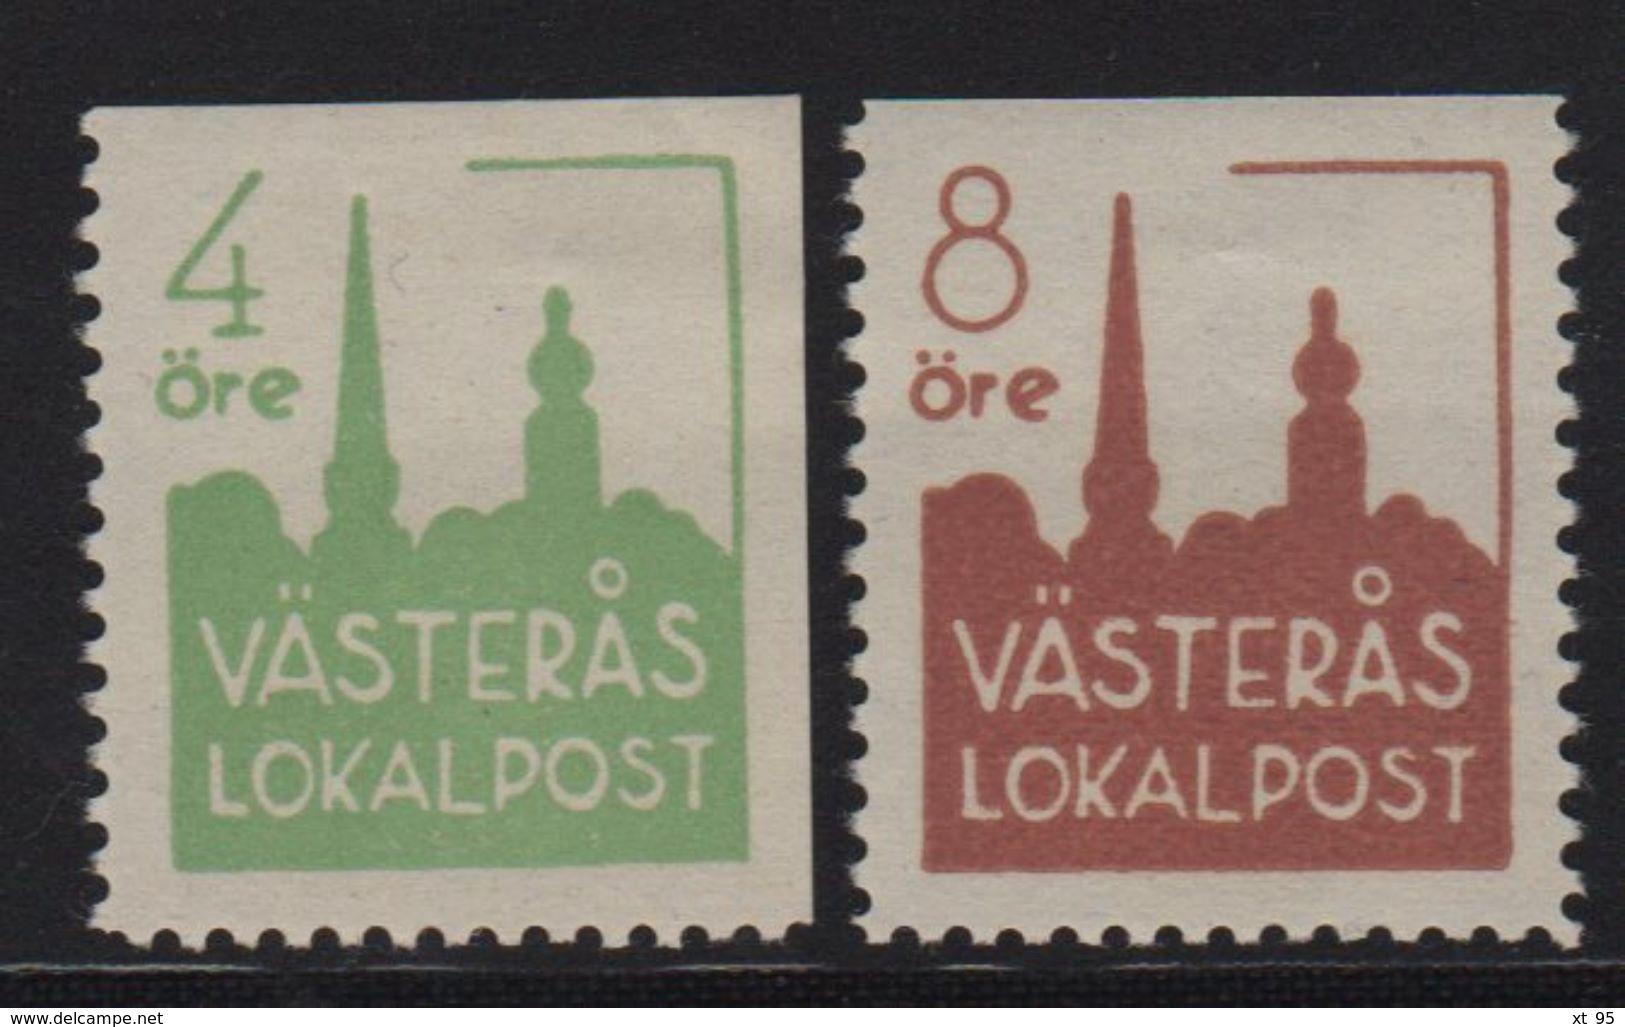 Norvege - Poste Locale - Vasteras - Norway